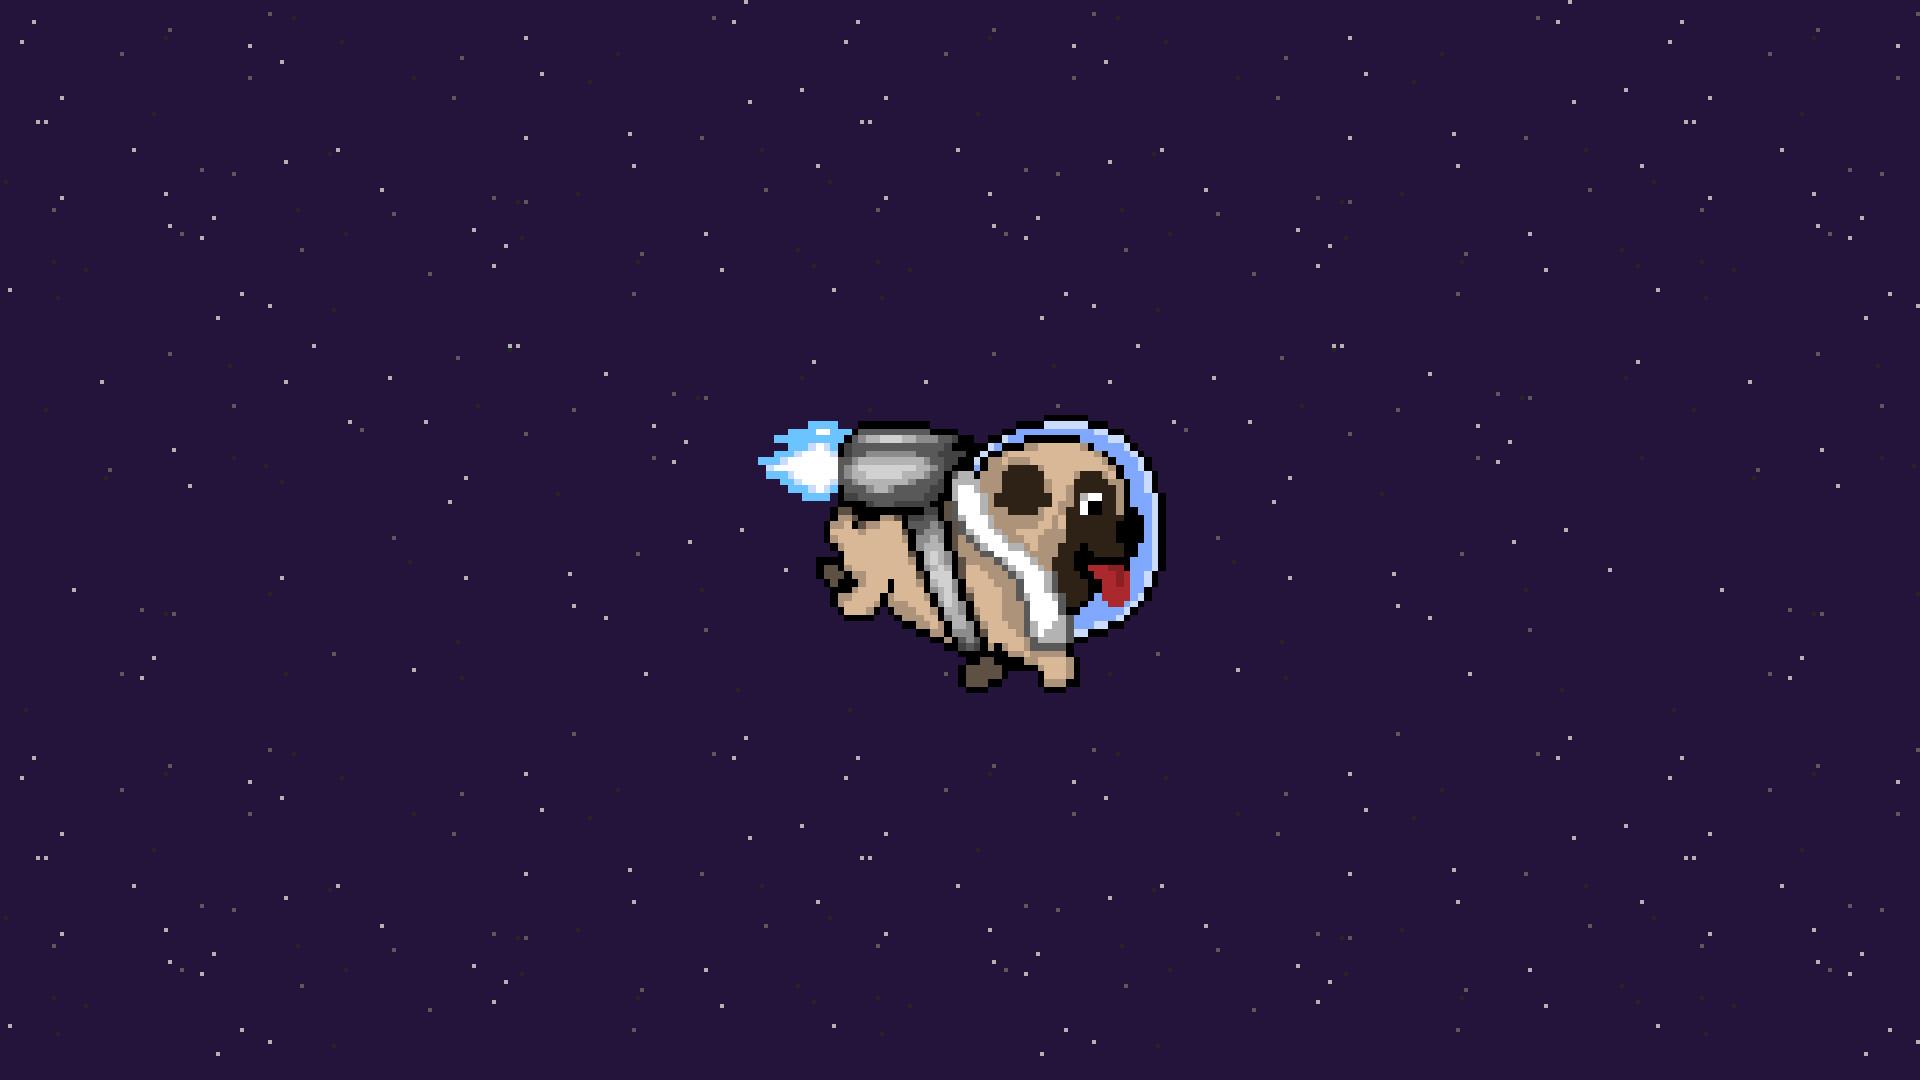 pug dog minimalism, hd artist, 4k wallpapers, images, backgrounds